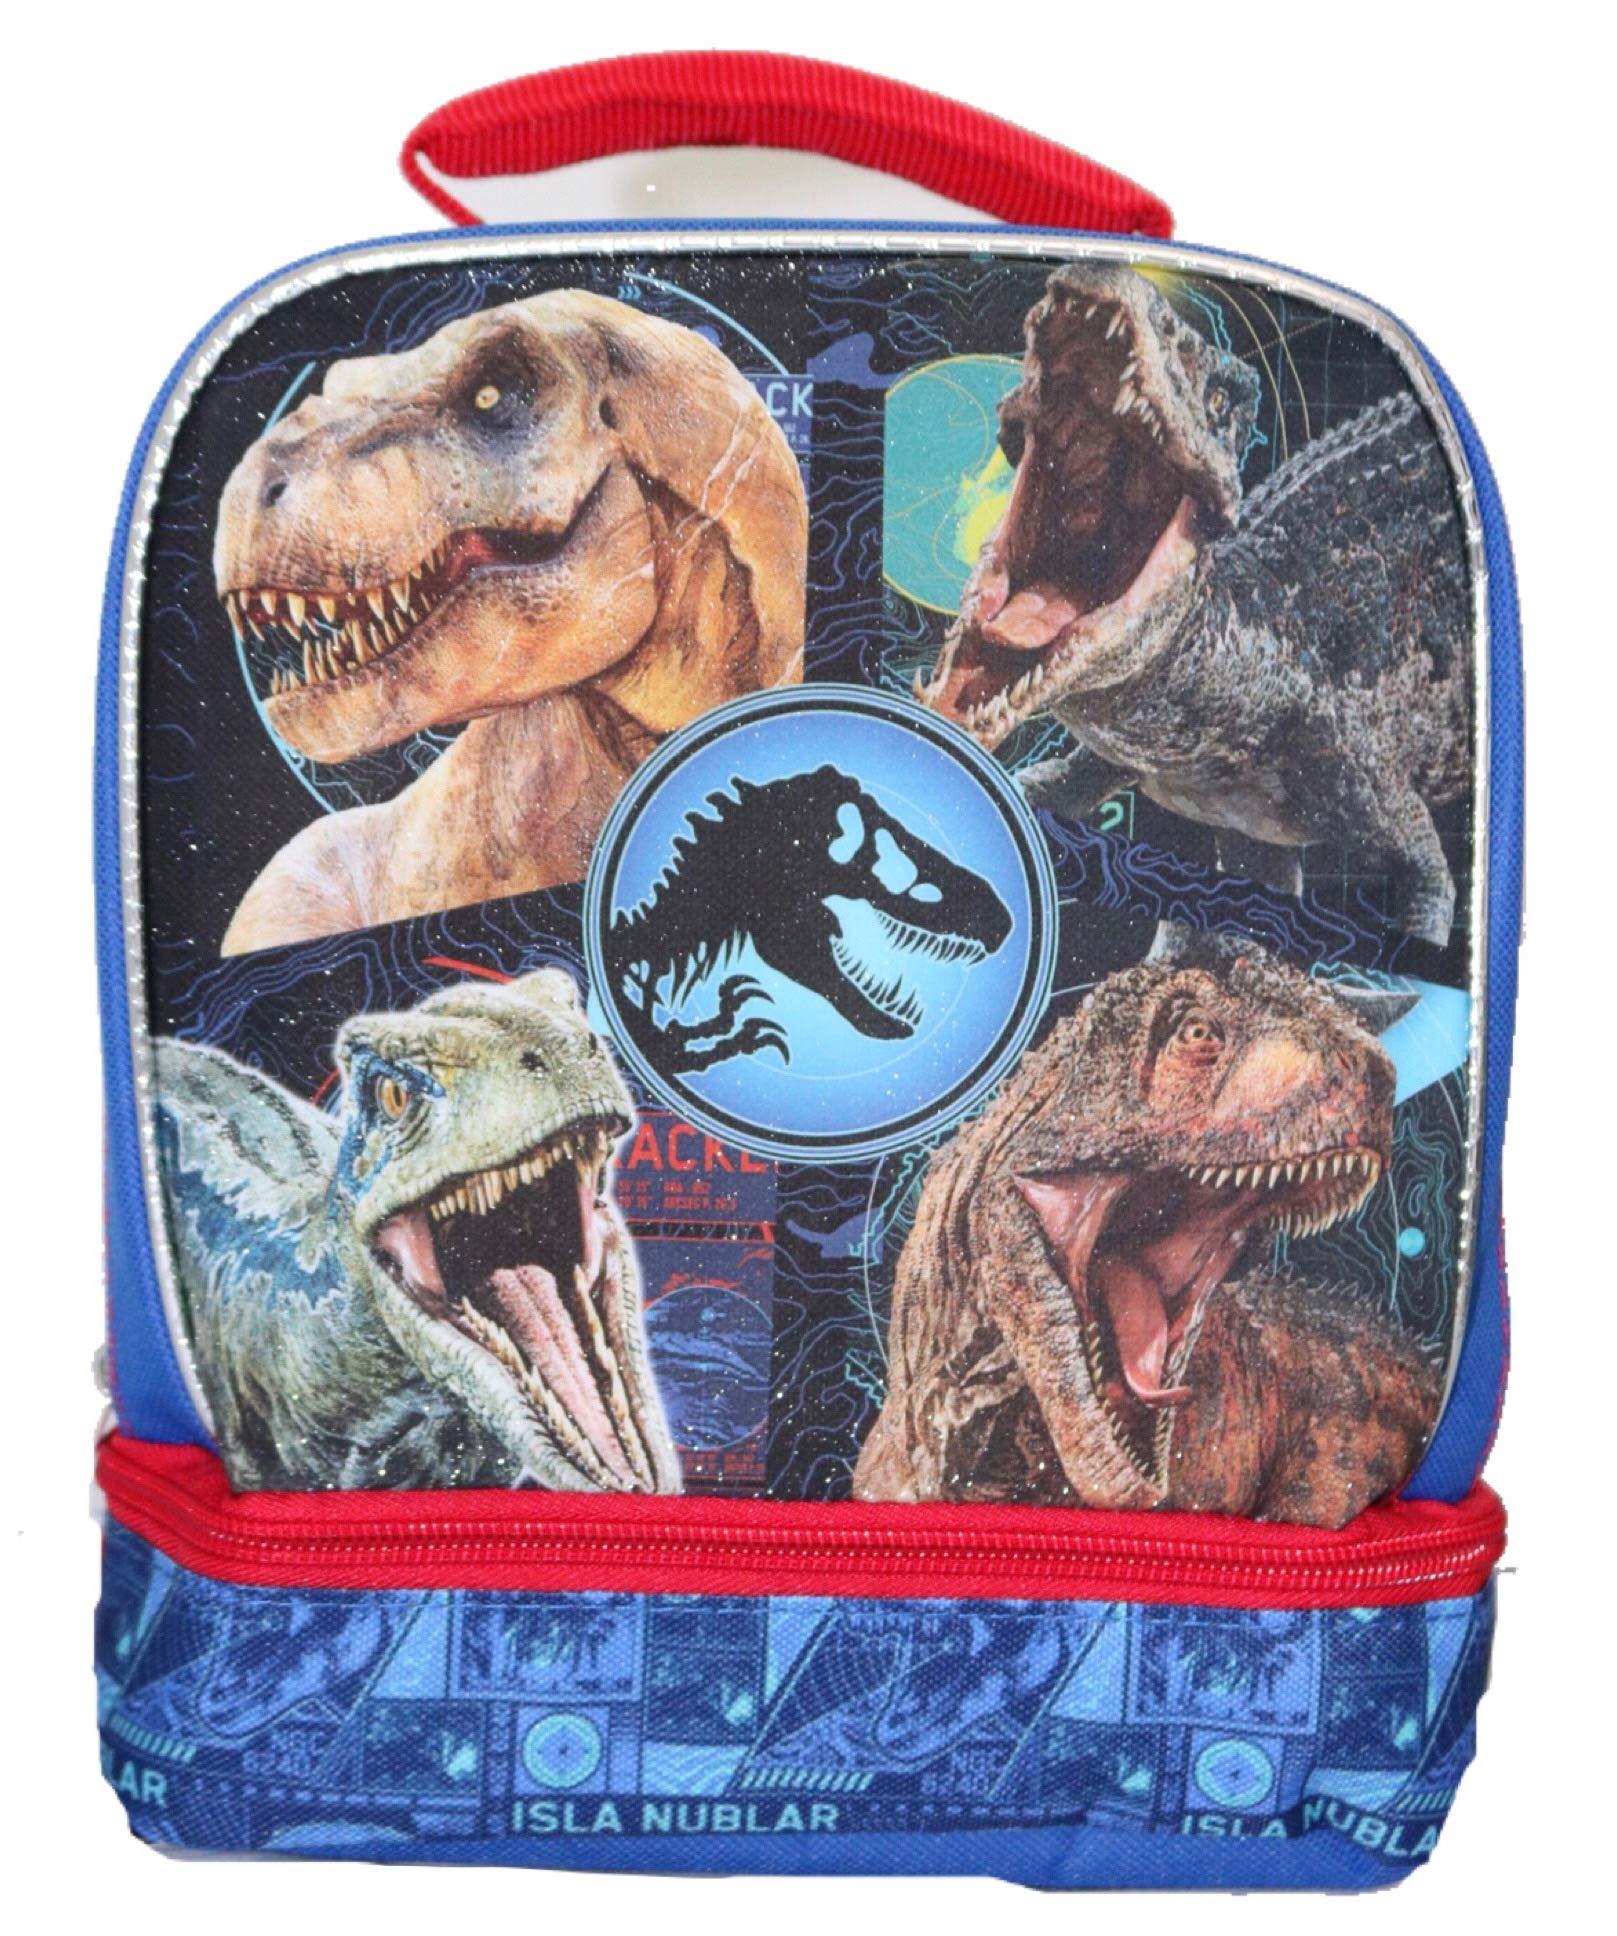 Universals Jurassic World Compartment Insulated